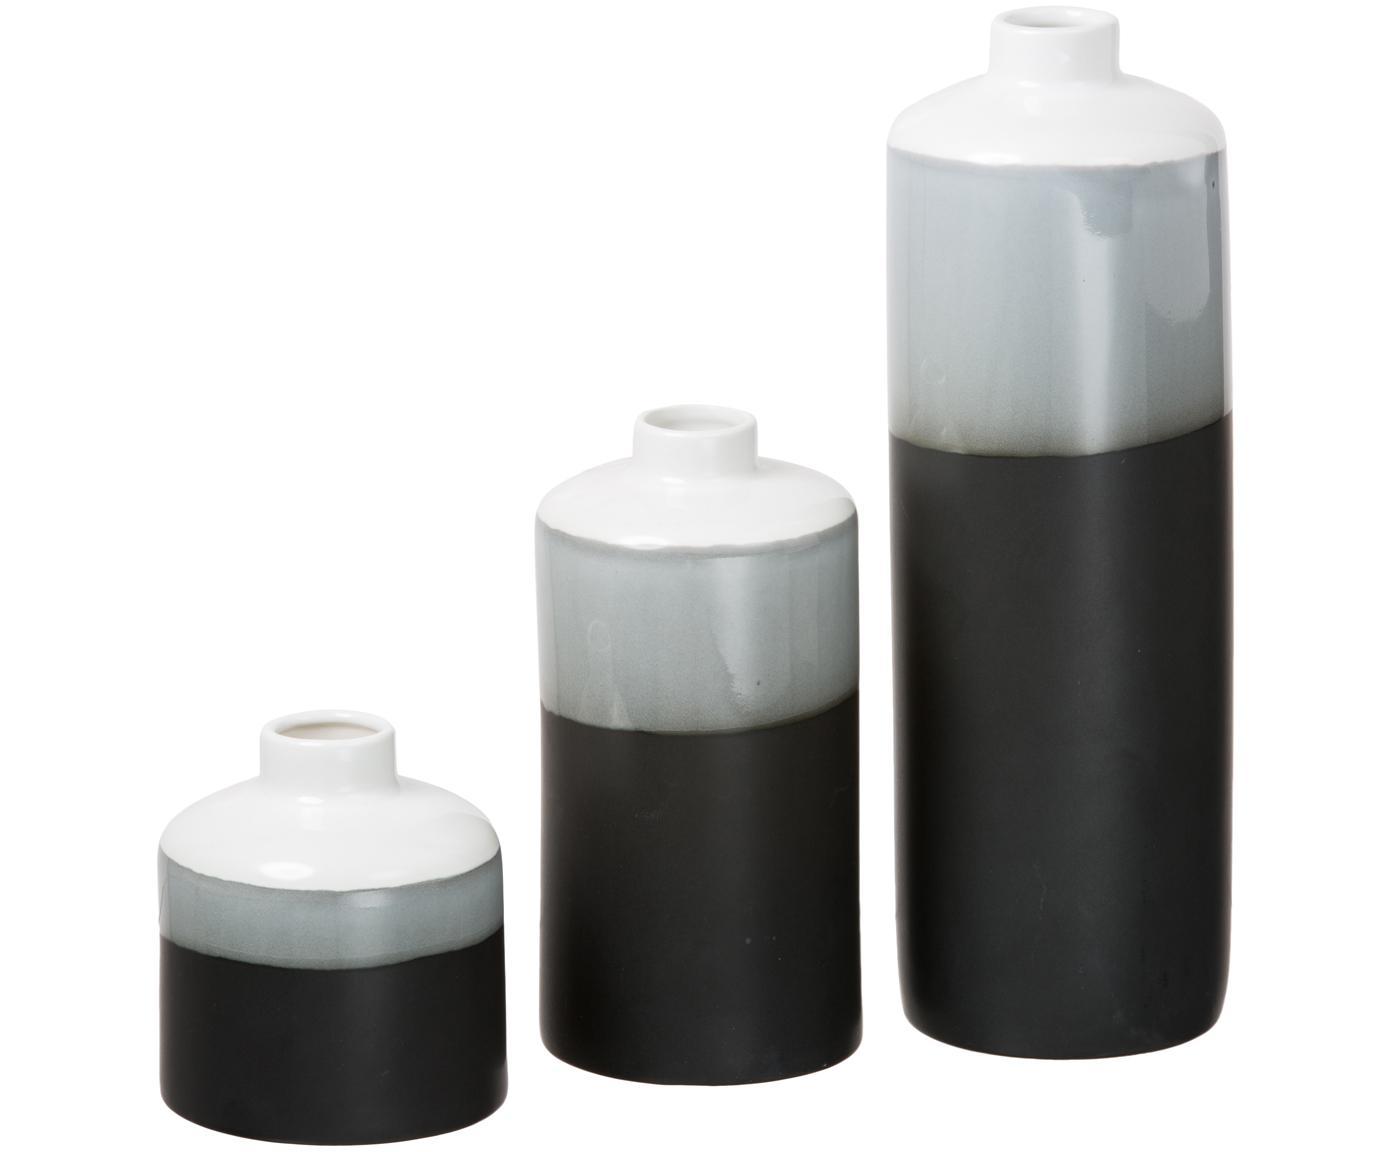 Vazenset Brixa, 3-delig, Porselein, Zwart, grijs, mat wit, Verschillende formaten